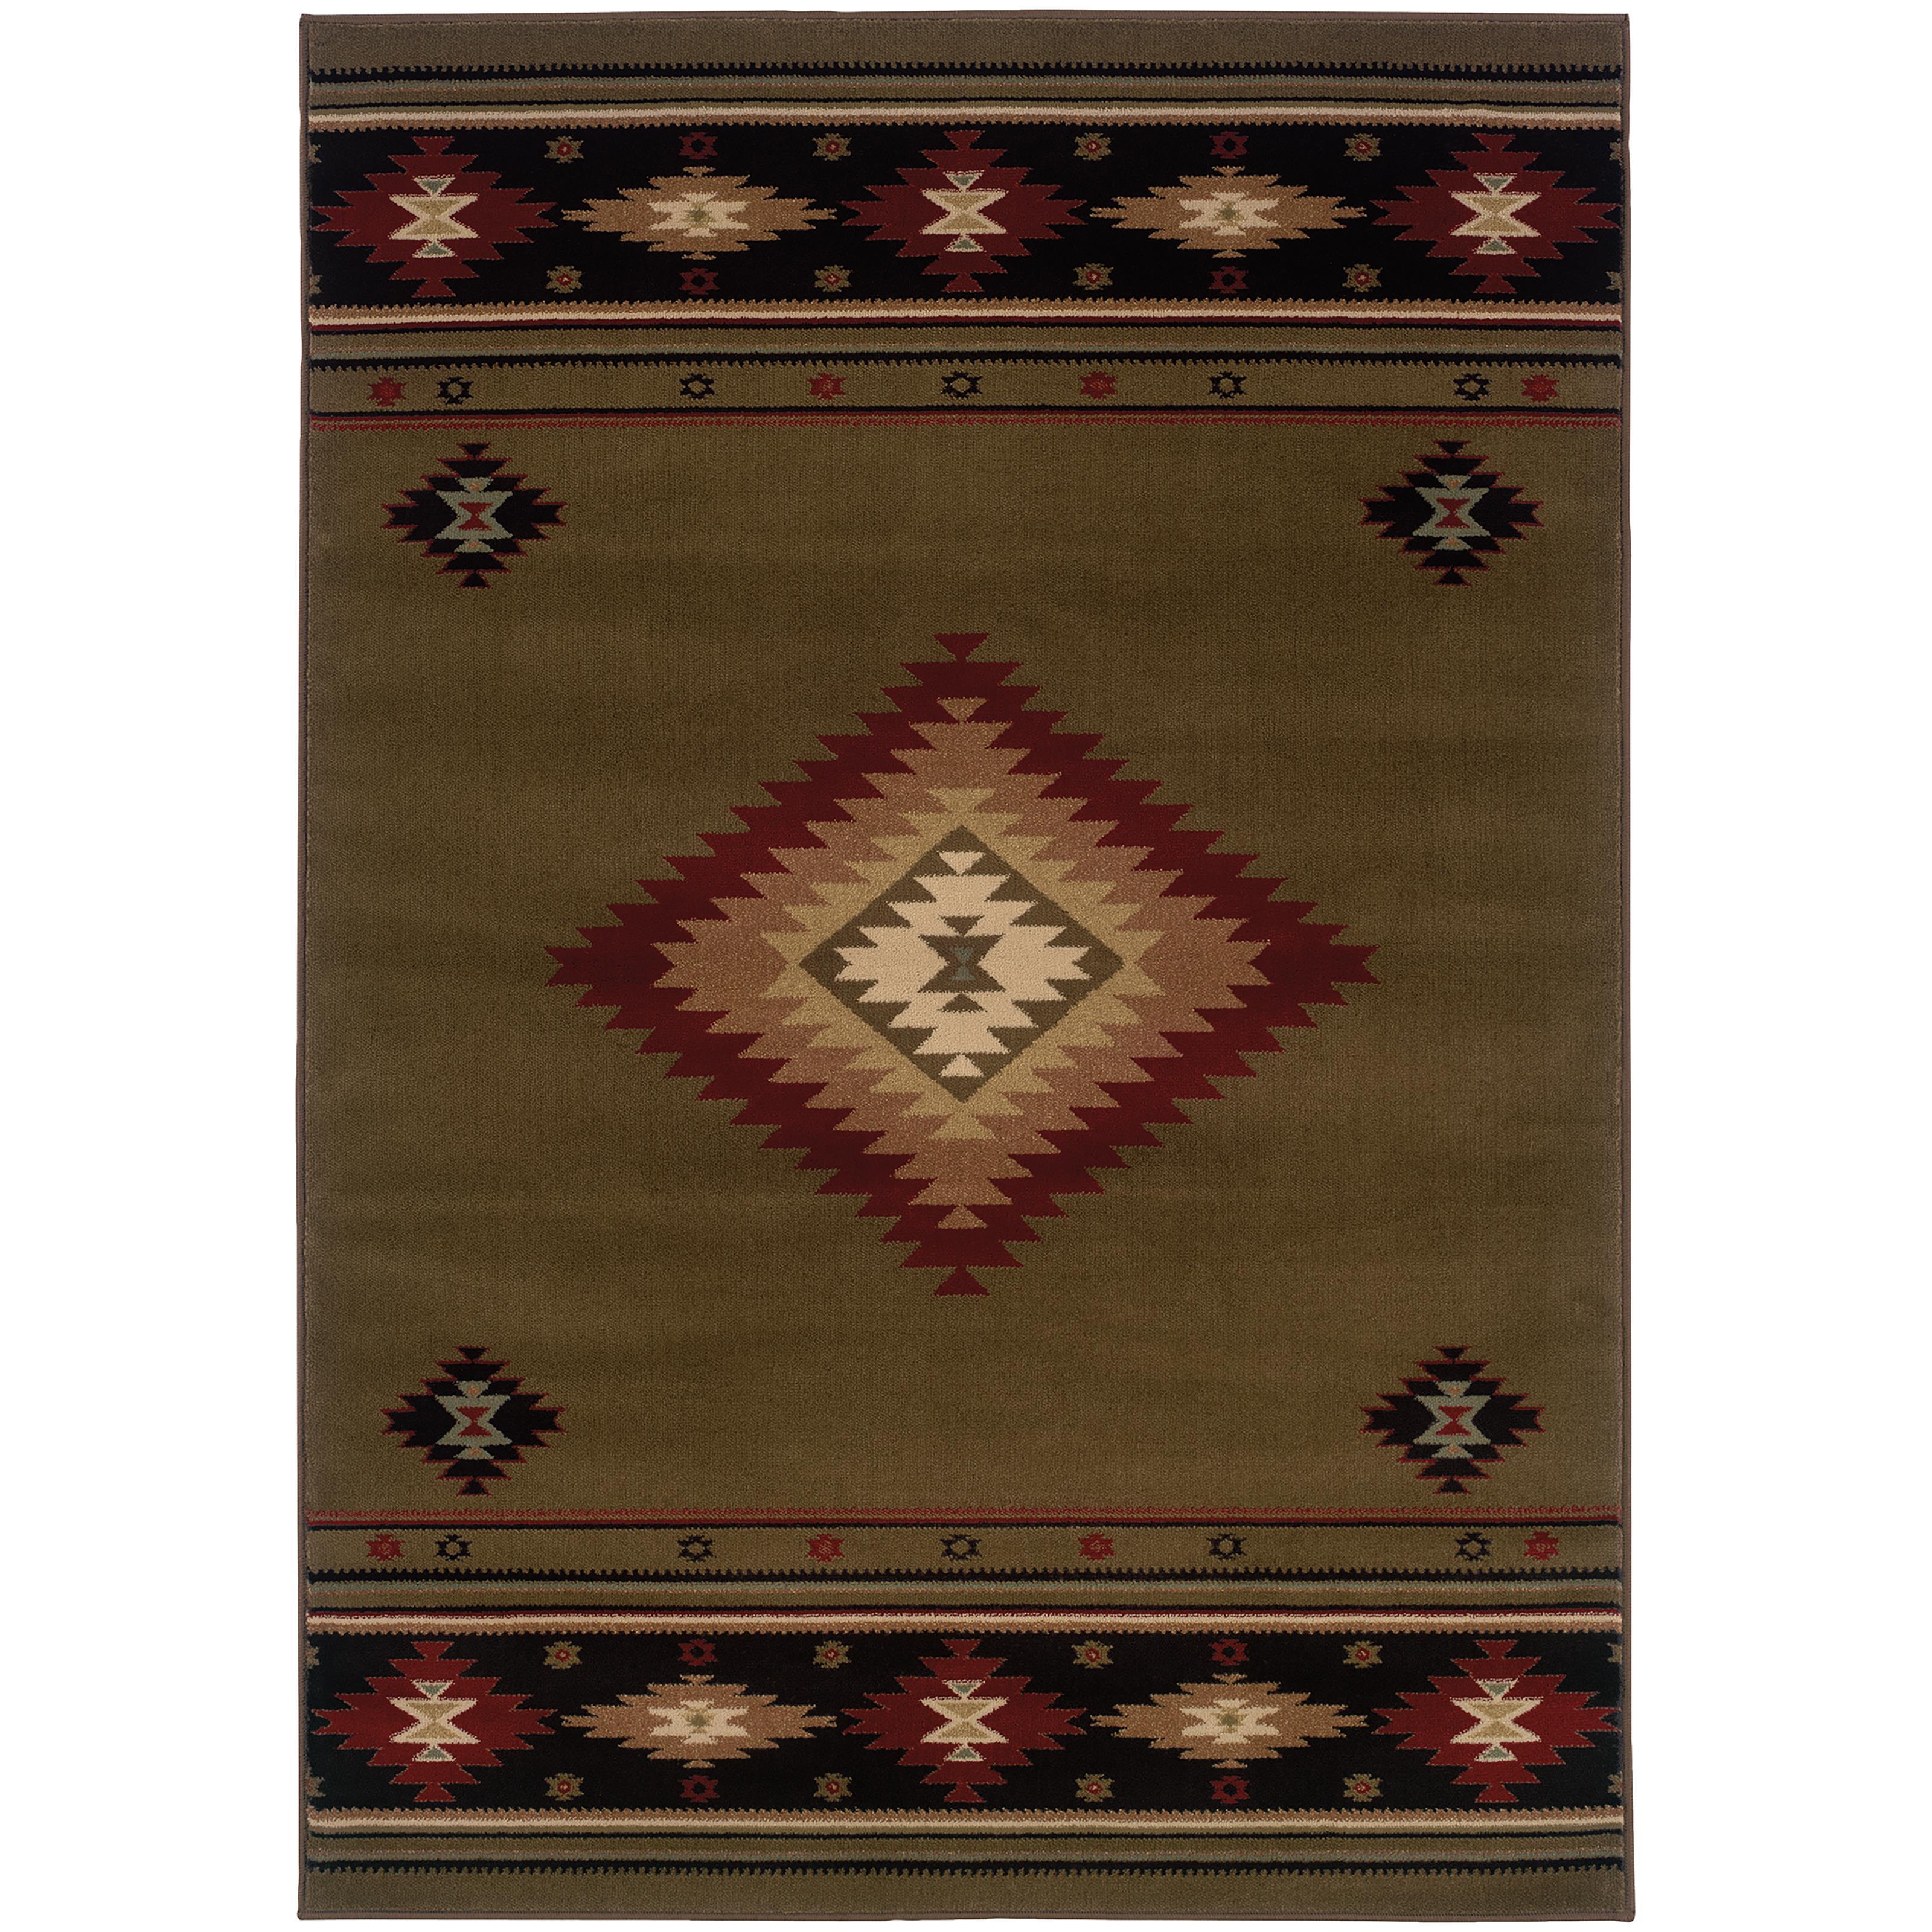 "Oriental Weavers Hudson 7' 8"" X 10'10"" Rug - Item Number: H087J1235330ST"